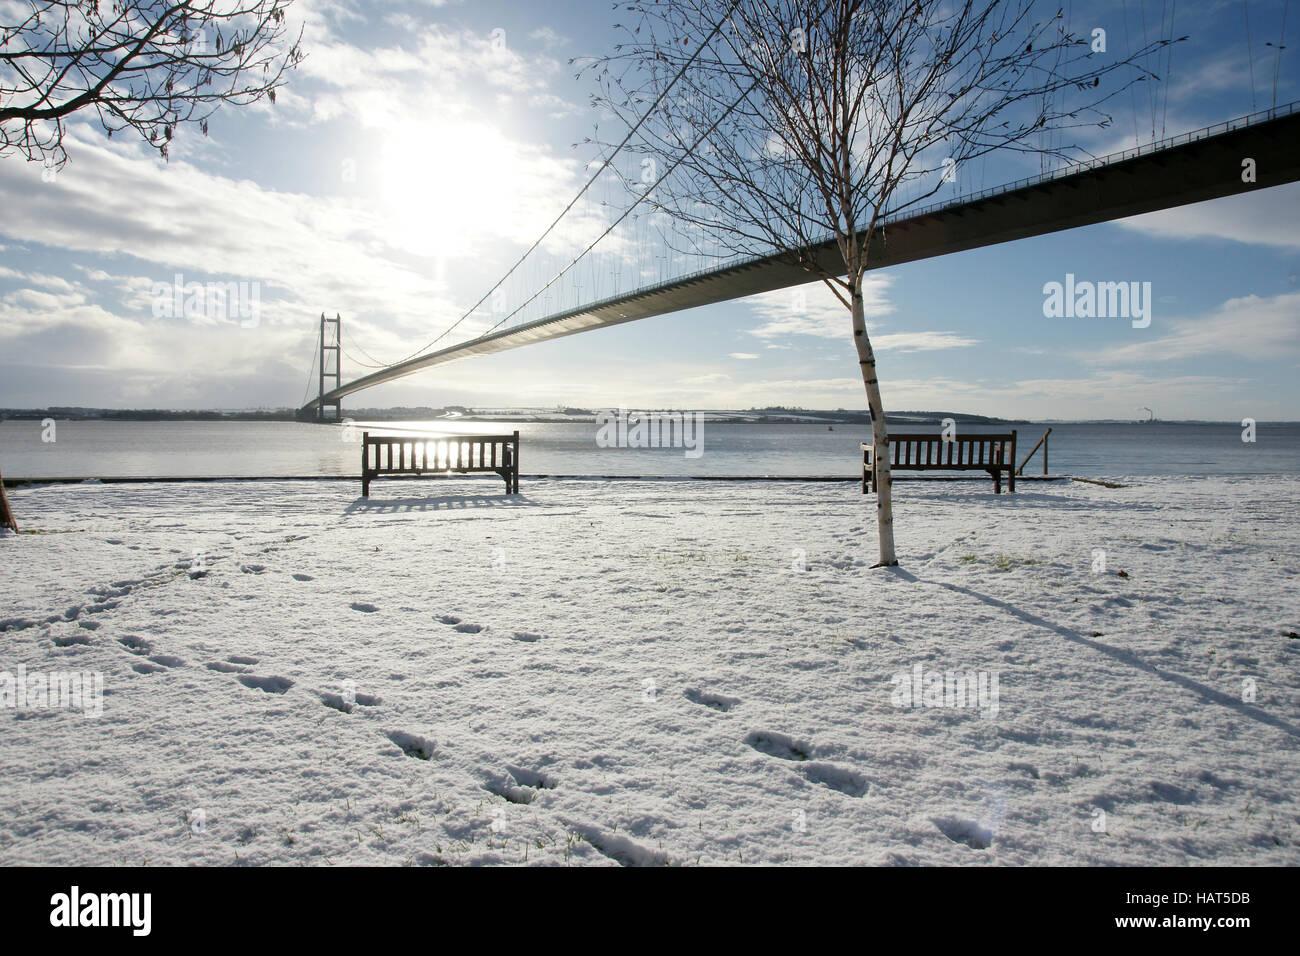 Humber Bridge, Hessle, Kingston upon Hull, snow - Stock Image